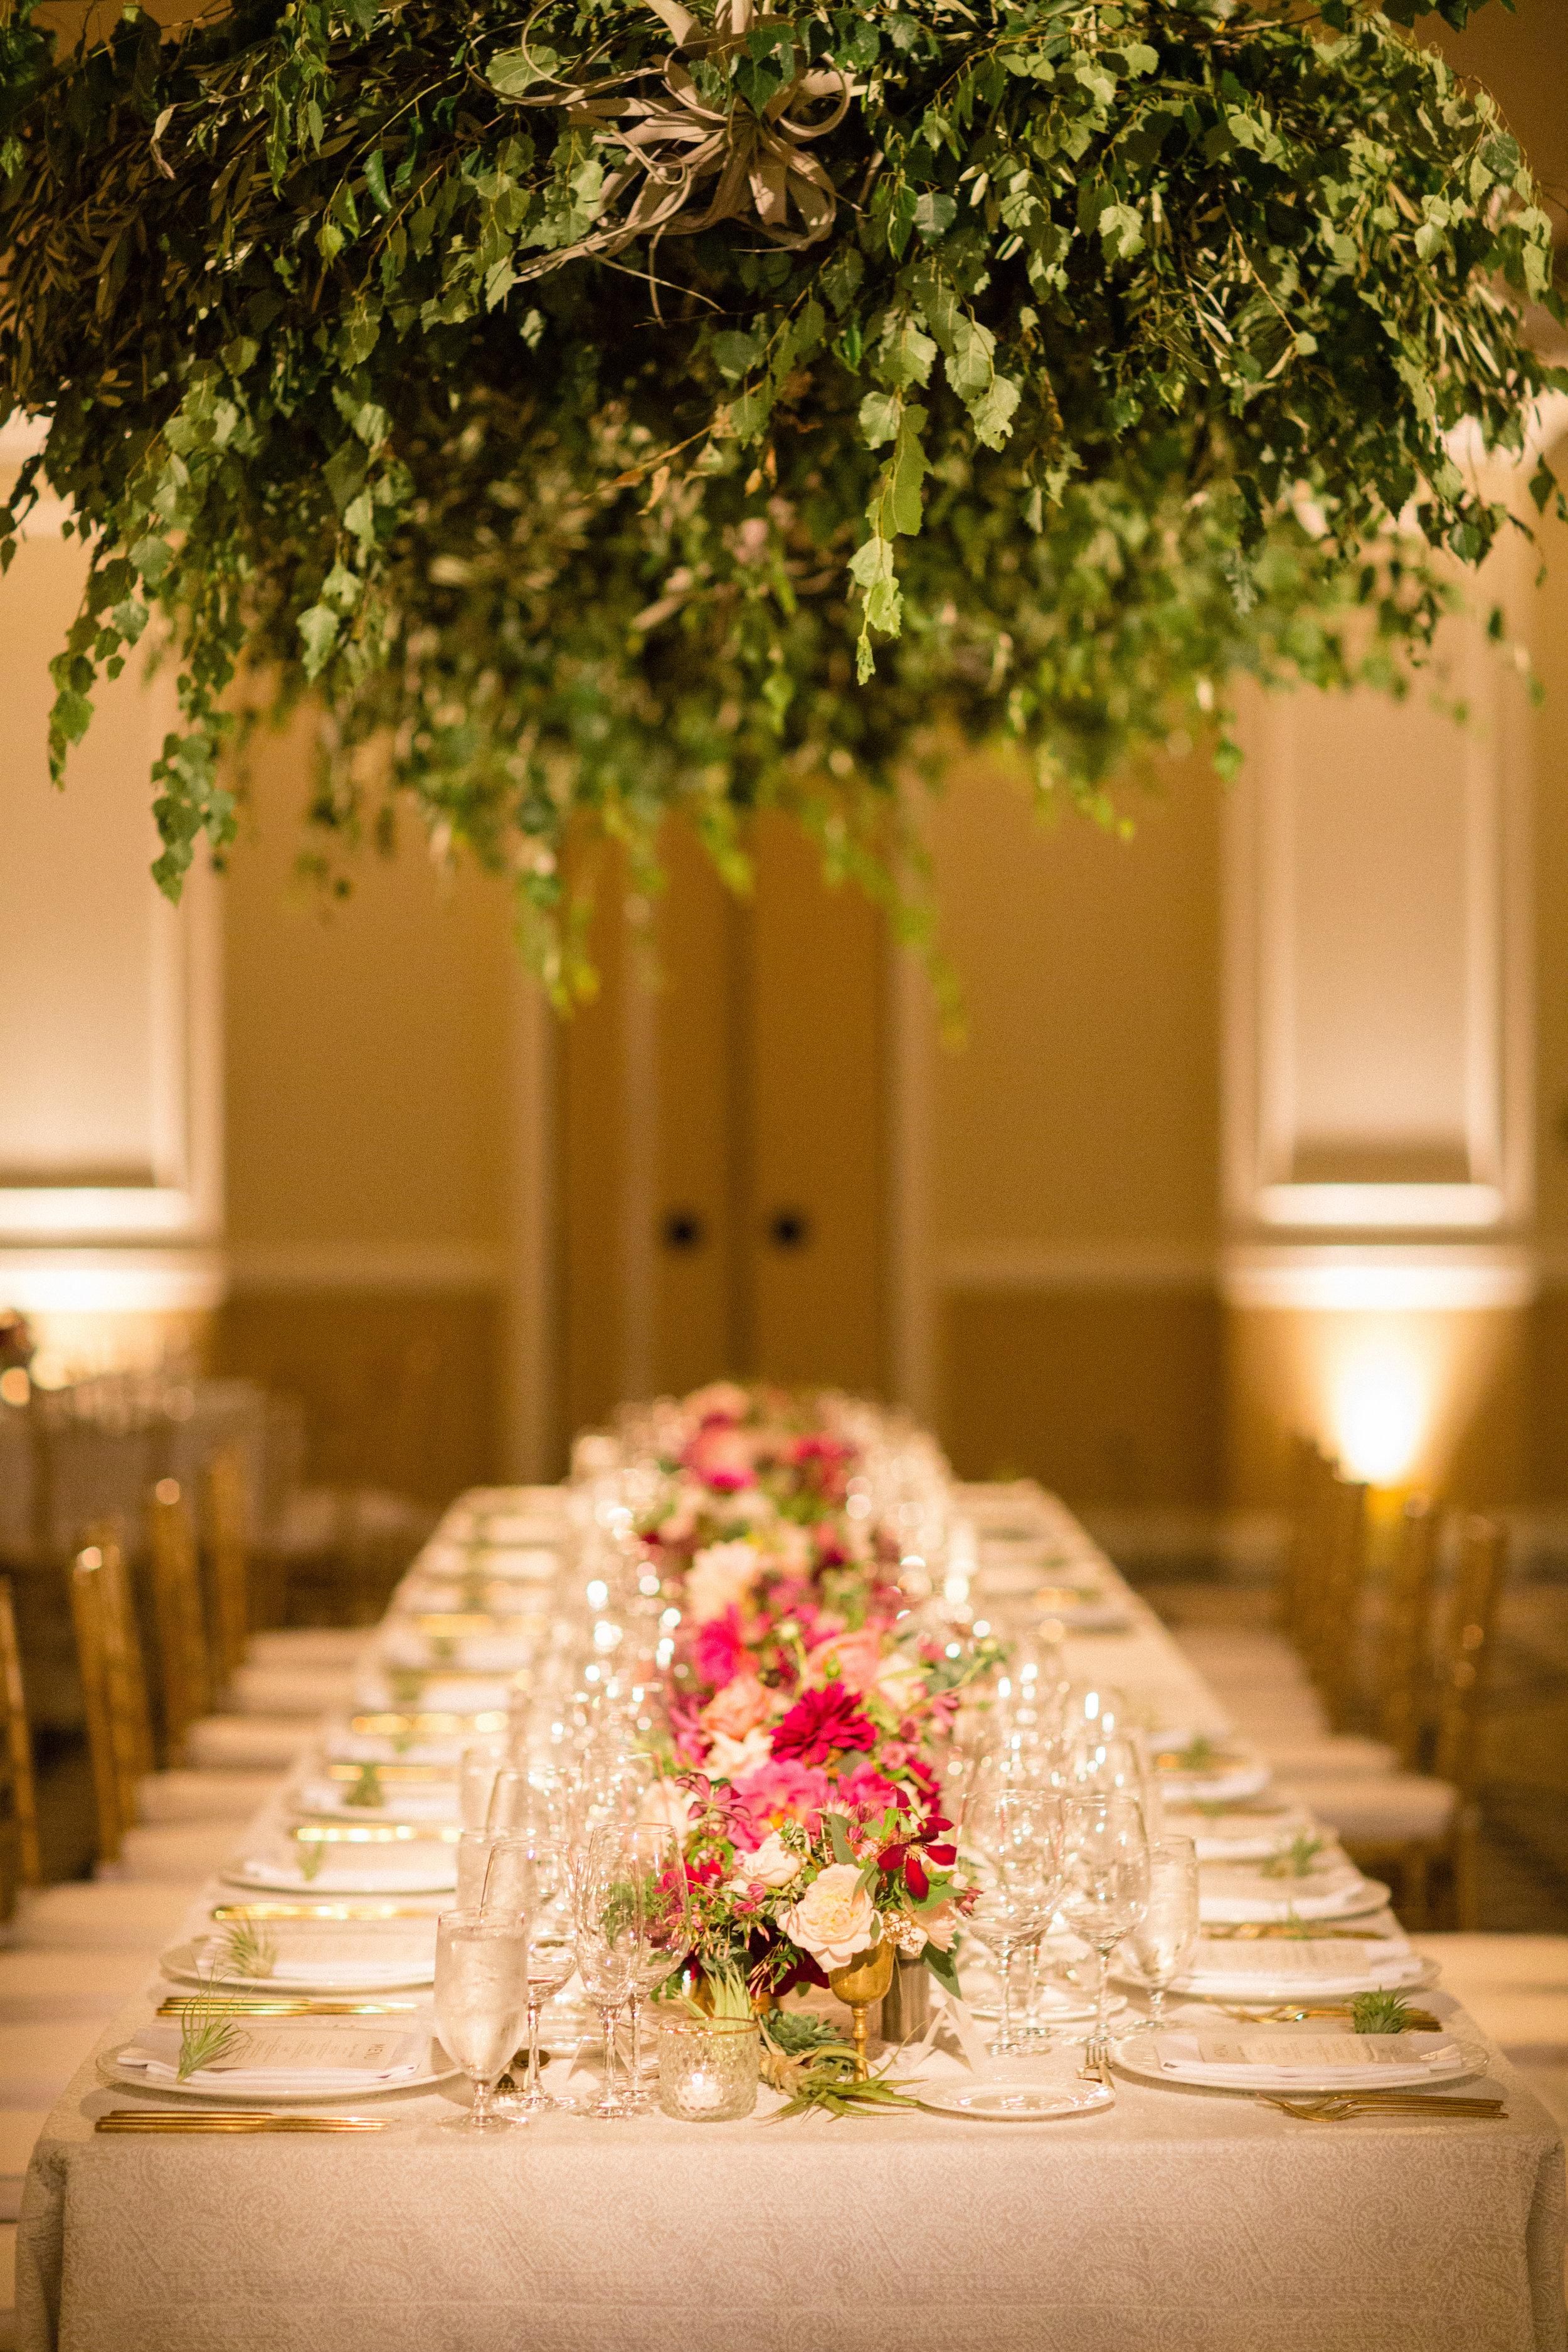 larissa-cleveland-sivanjeremy-wedding-0937 copy.jpg